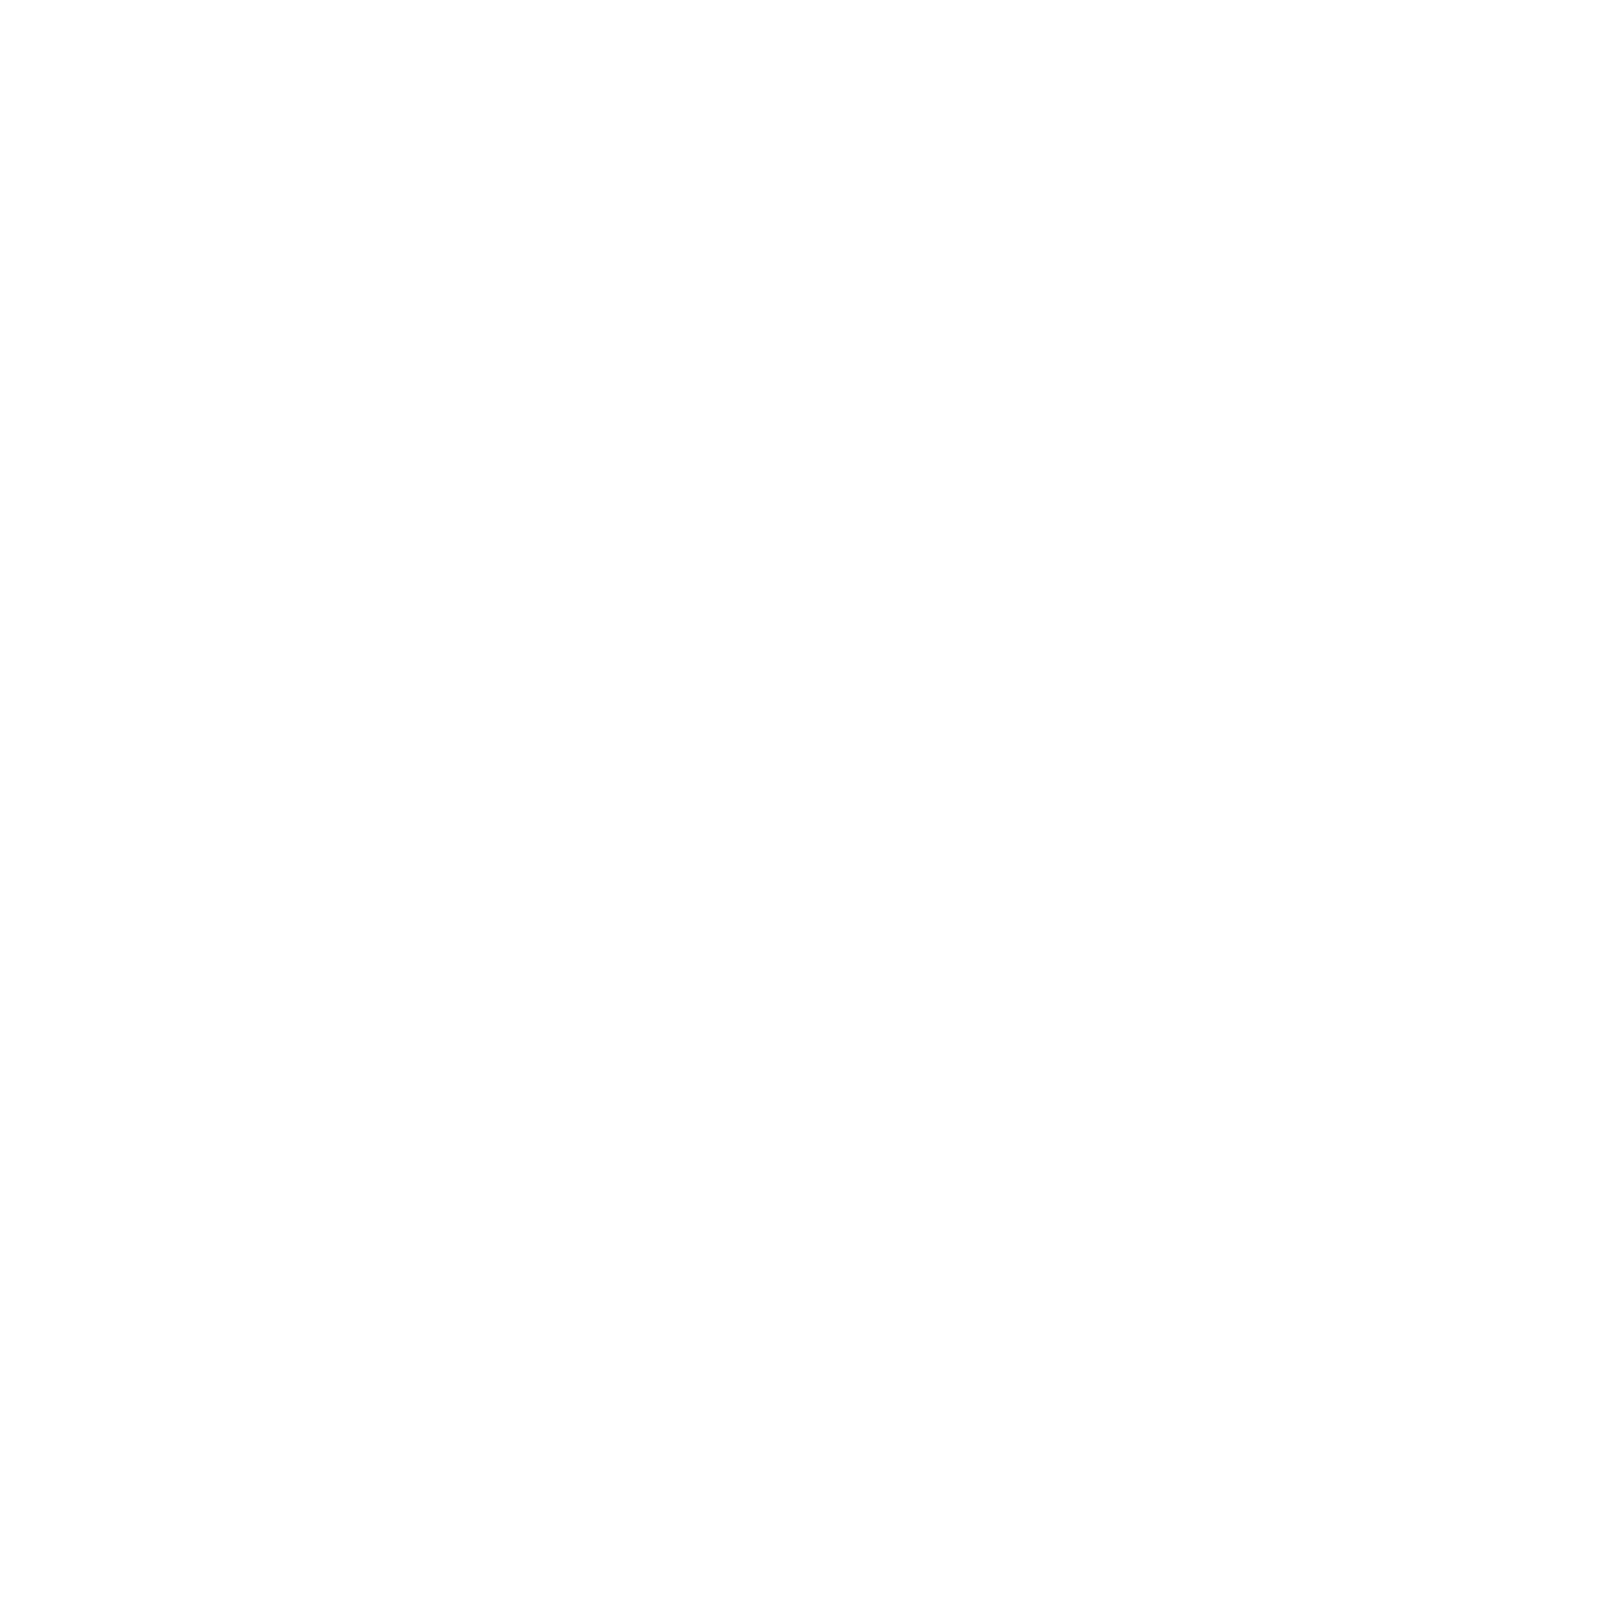 Gordon-Murray-Automotive-project-logo copy.png